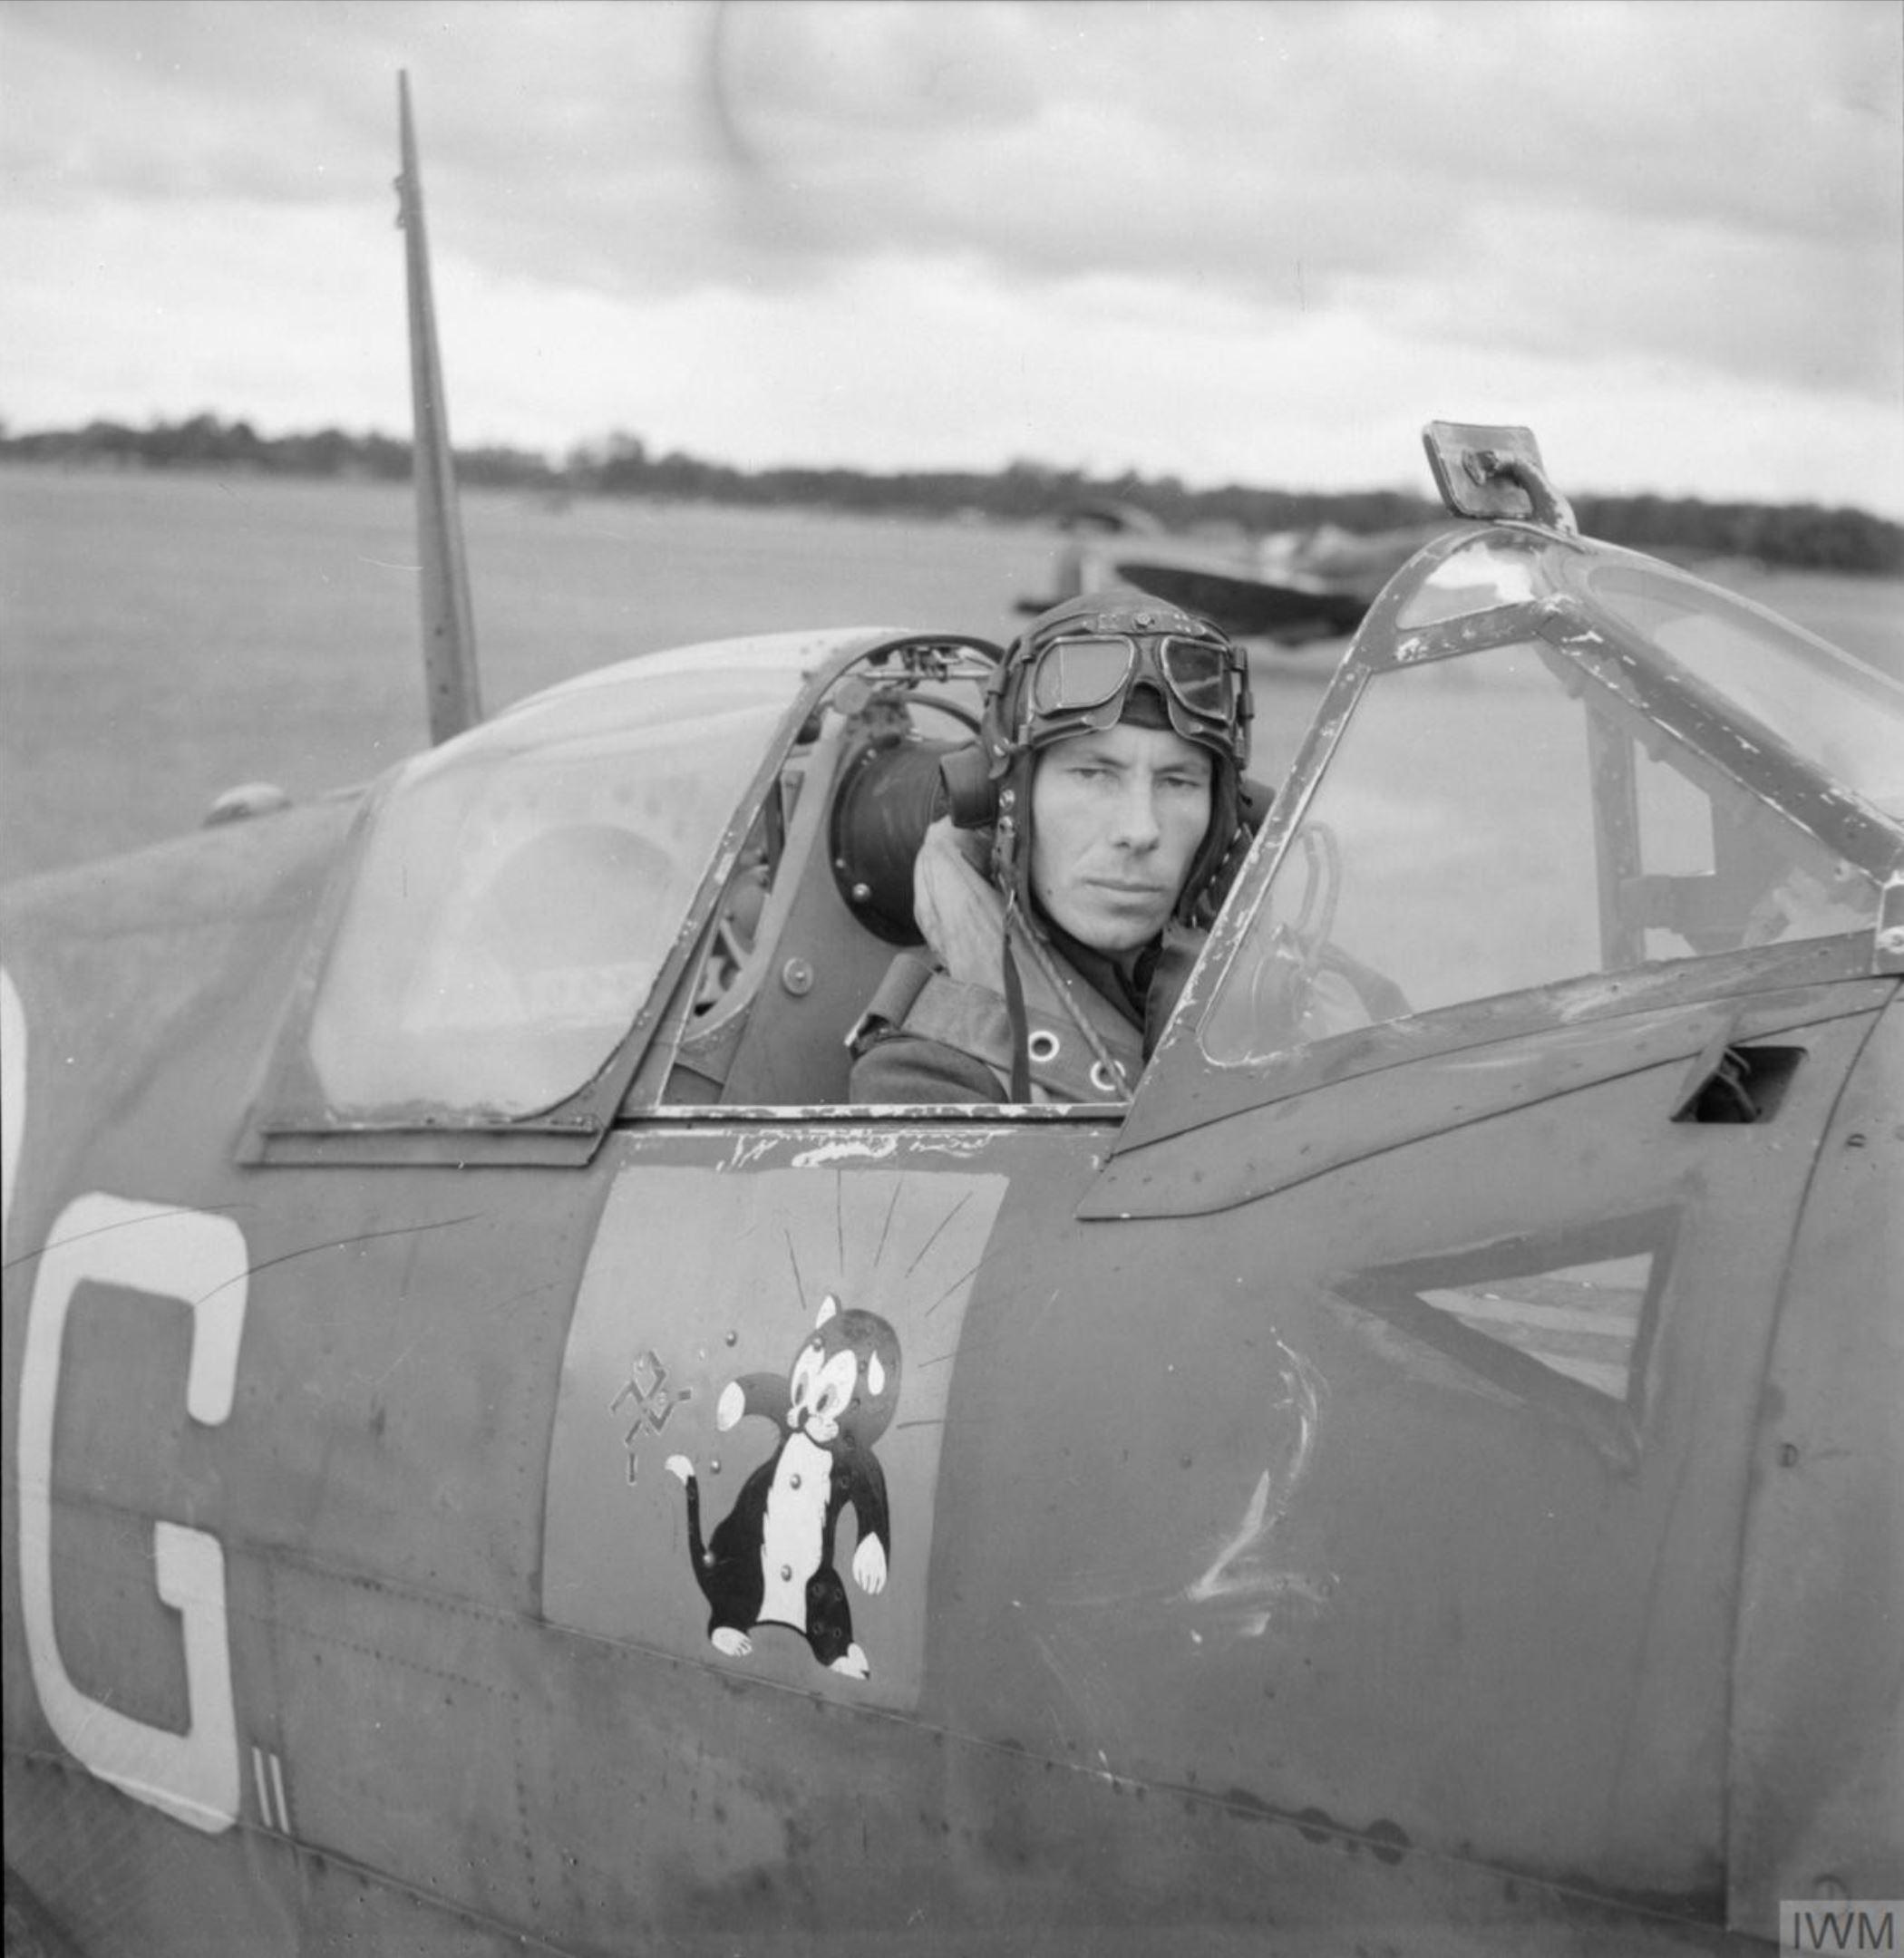 Spitfire Vb RAF Ibsley Wing RG with IR Gleed at Ibsley Hampshire IWM CH5908